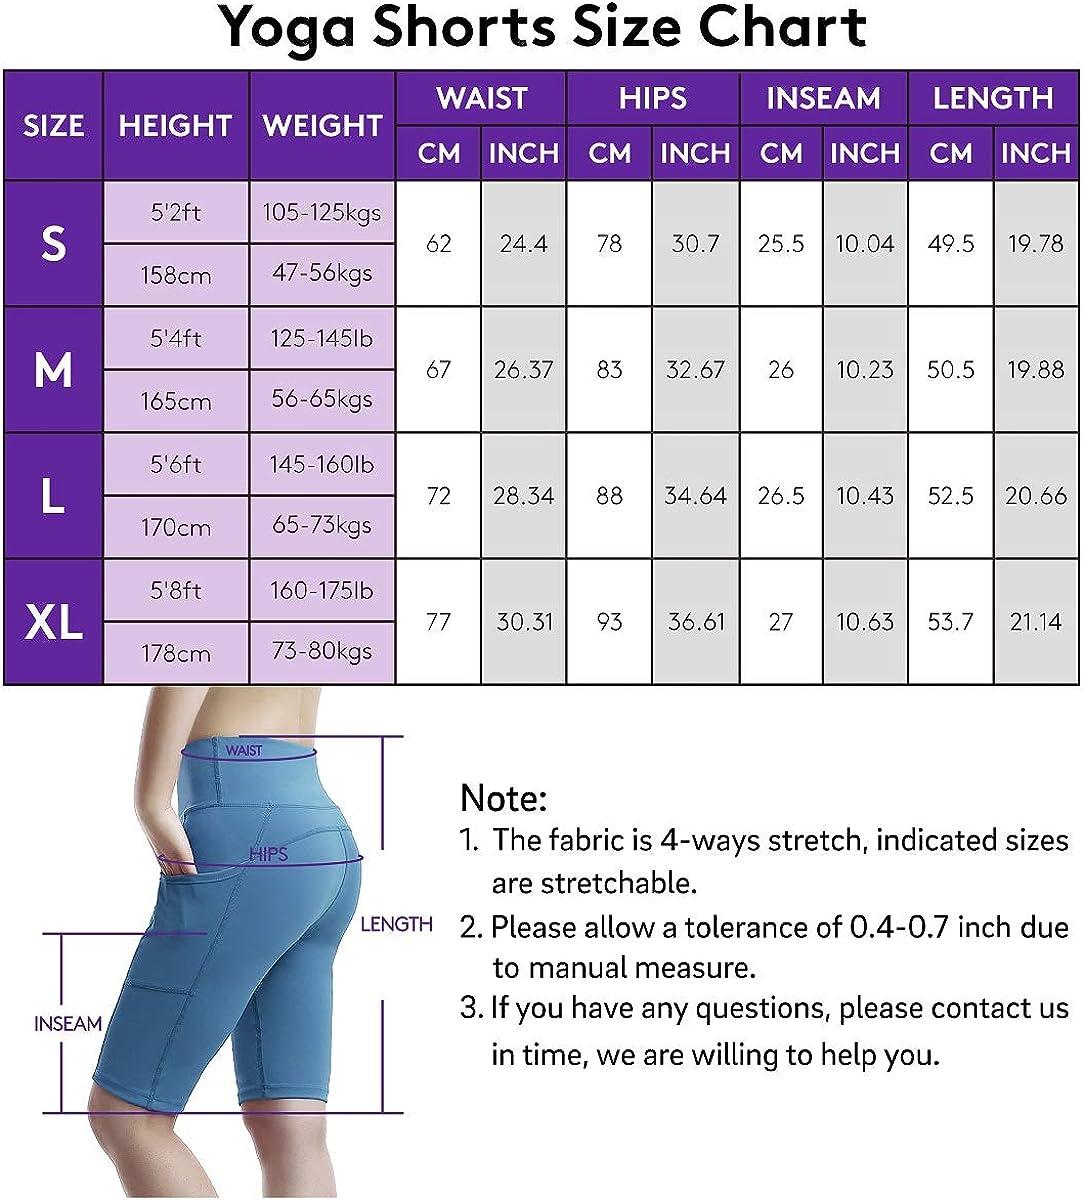 USHARESPORTS Biker Shorts for Women High Waist Yoga Workout Shorts for Women with Pockets Spandex Gym